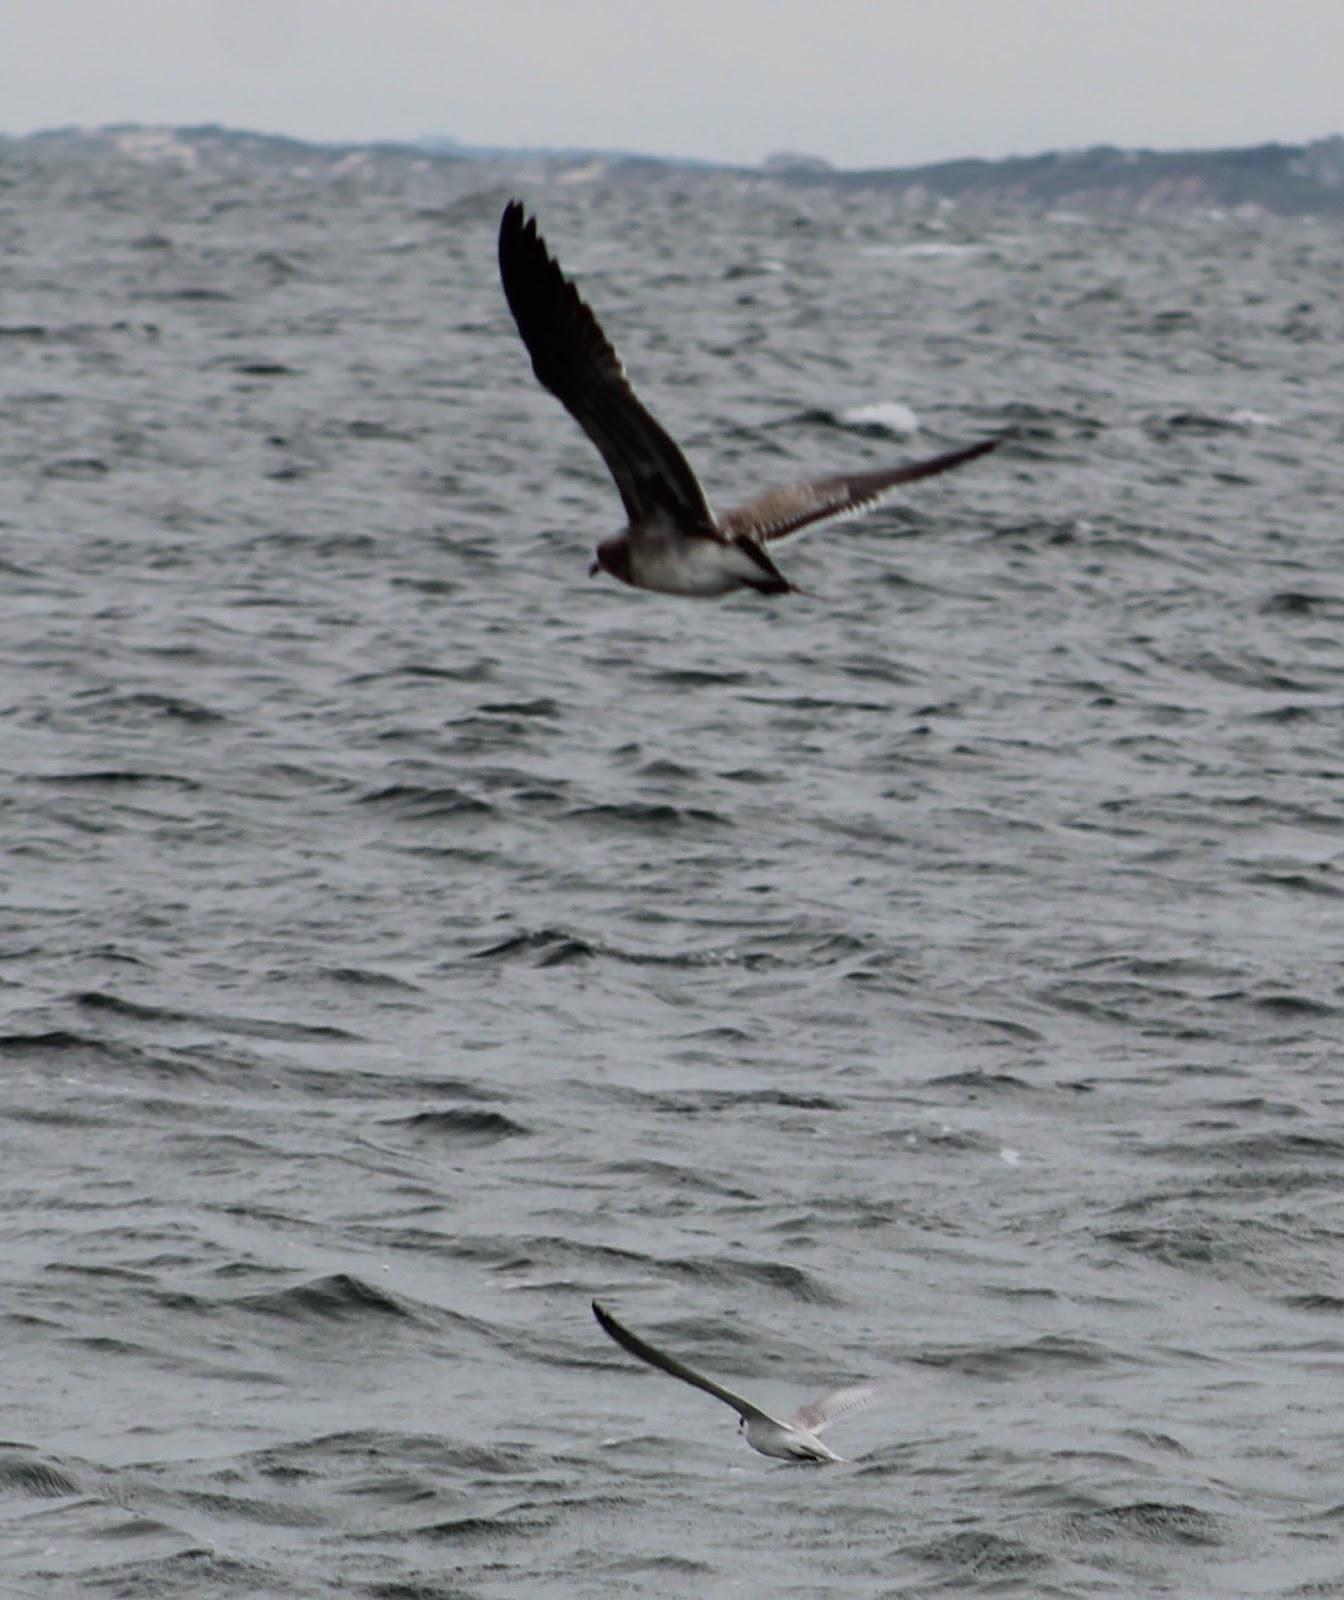 Cape Cod Bird Nerd